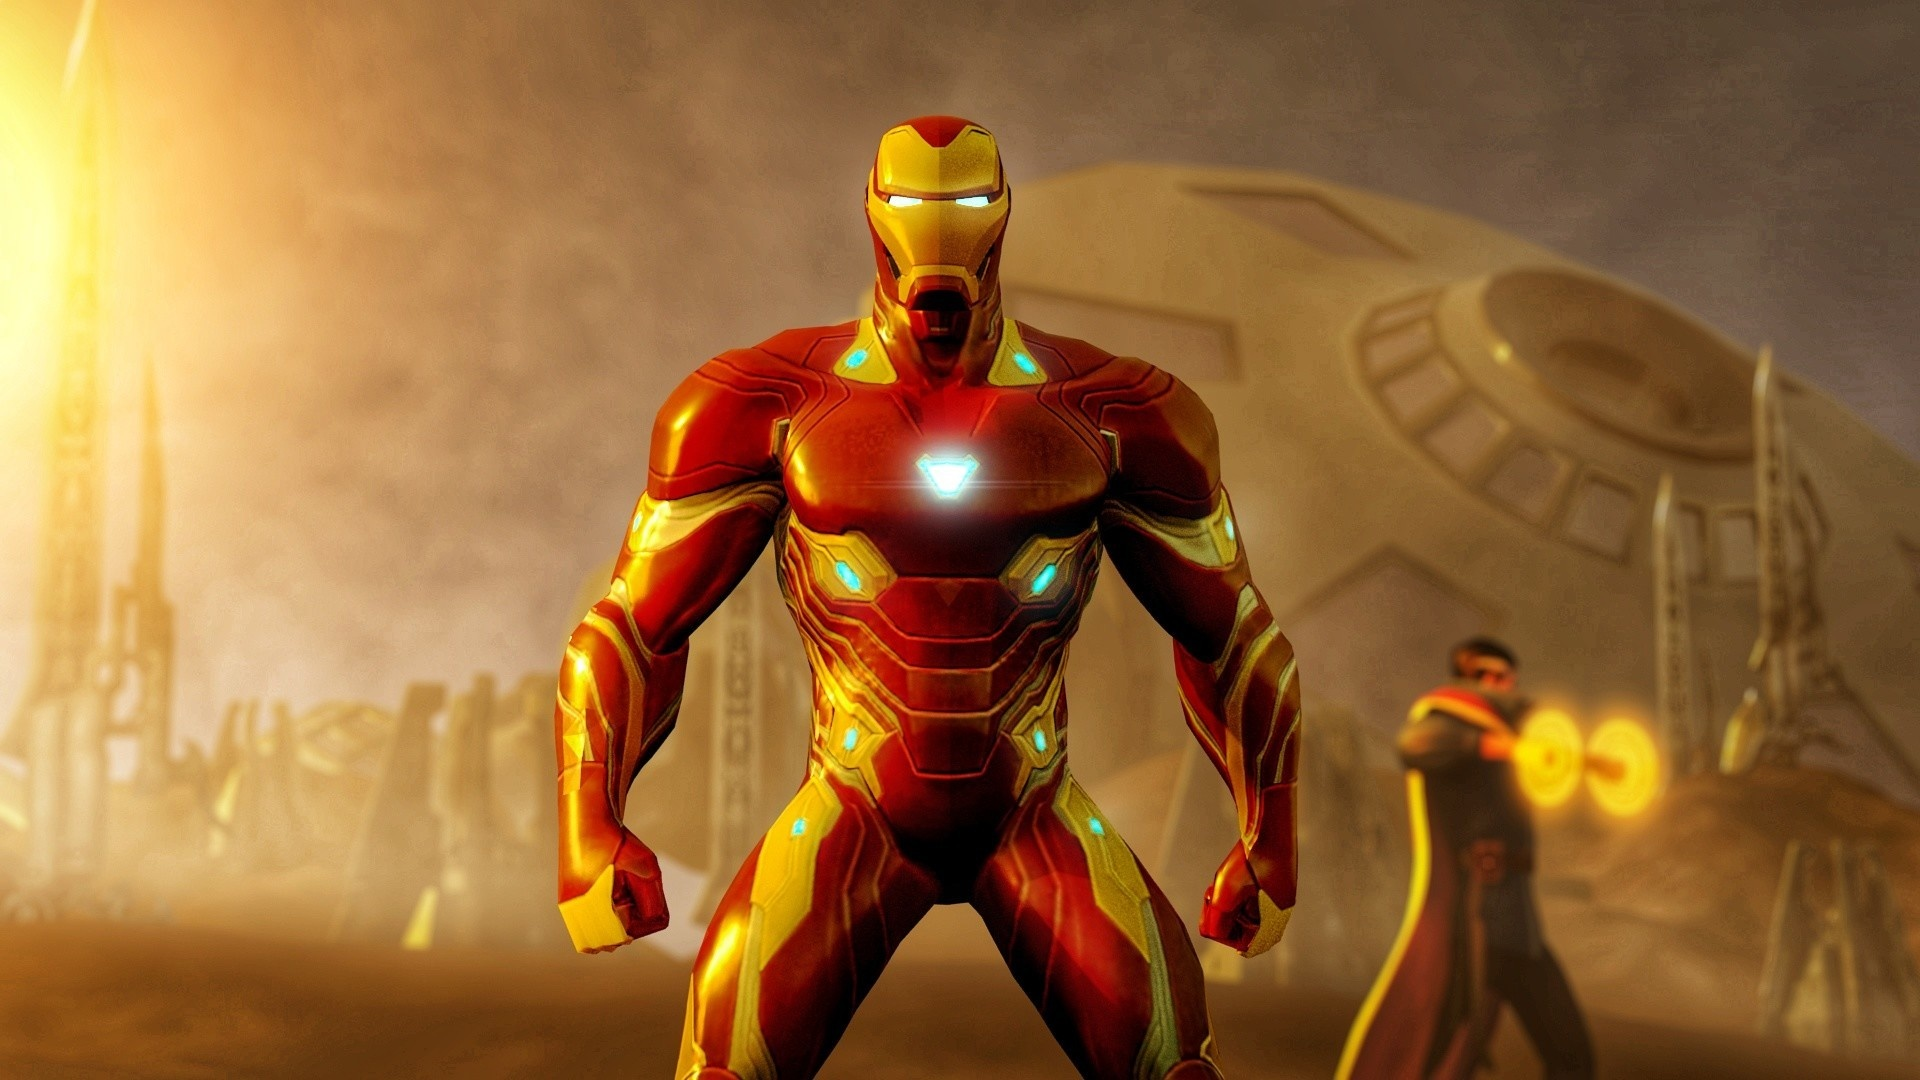 Download 1920x1080 Wallpaper Iron Man Vibranium Suit